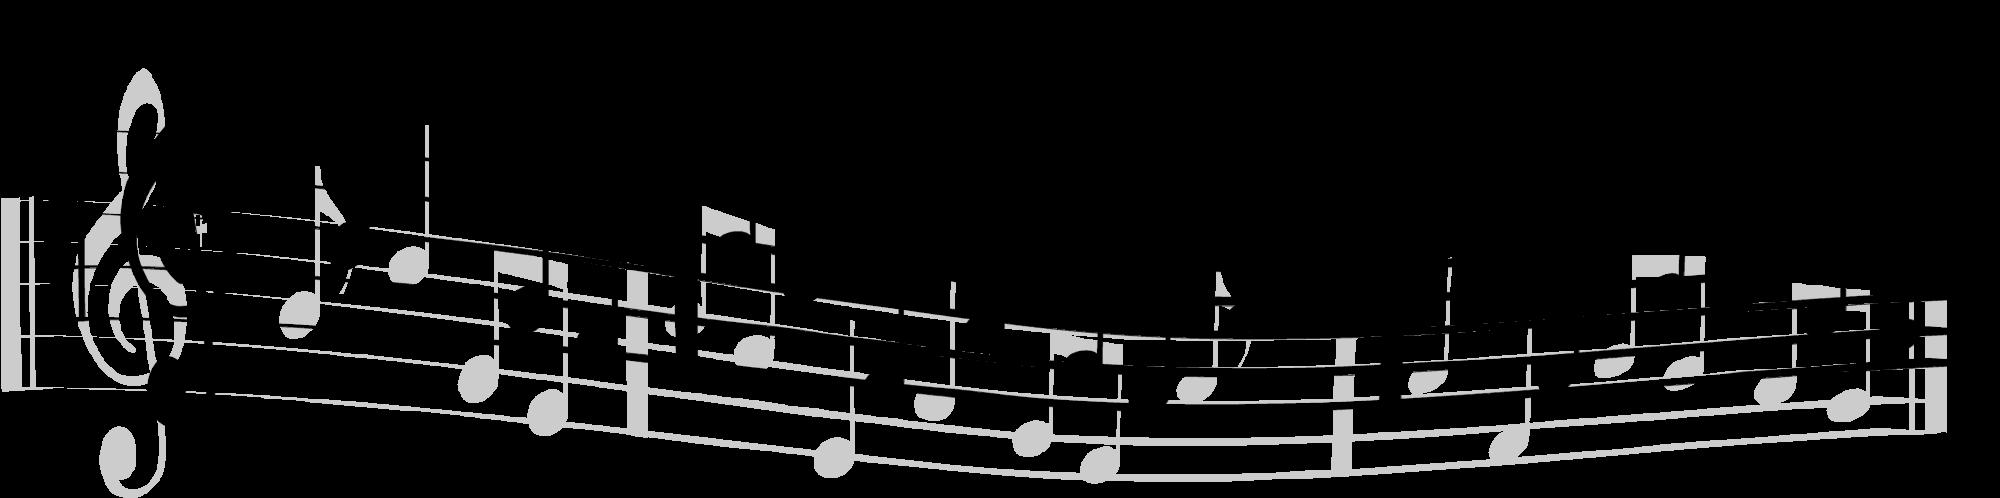 Music Staff Clip Art.